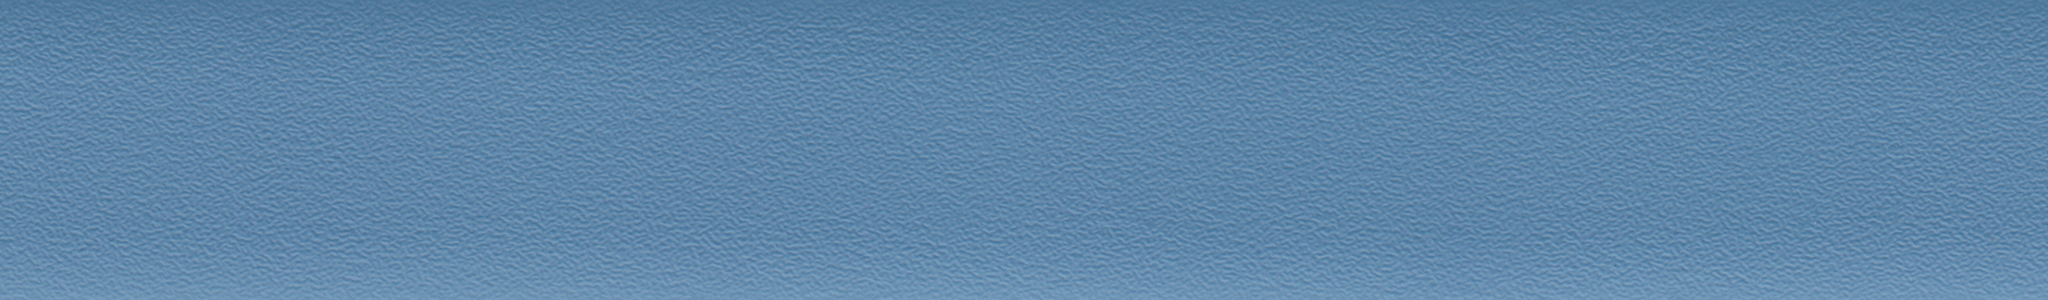 HU 15538 ABS hrana modrá oceán perla 101